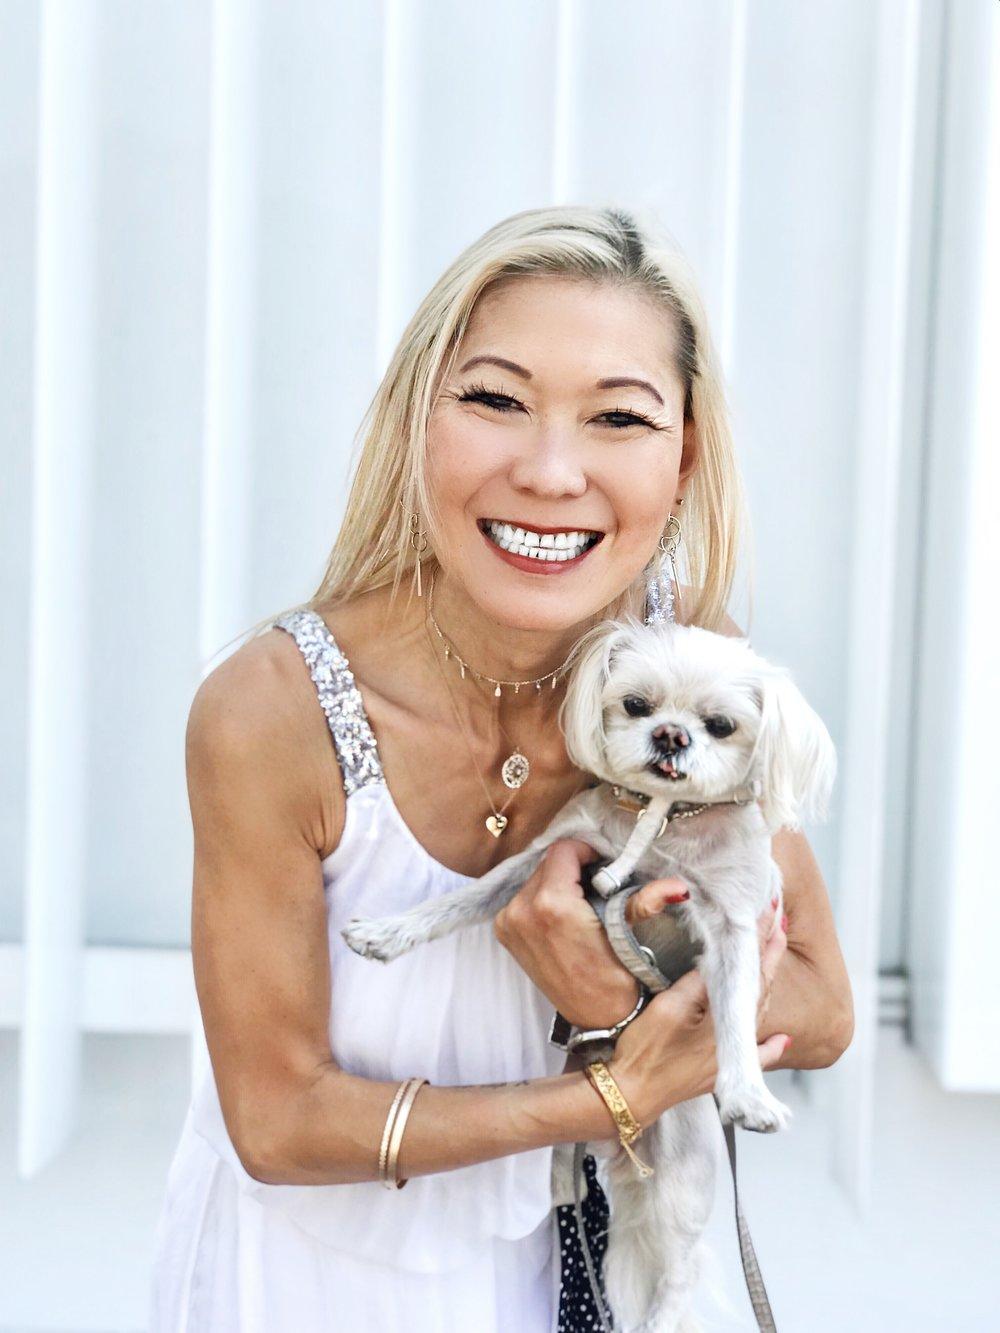 Shana Lynn Yao, branding strategist